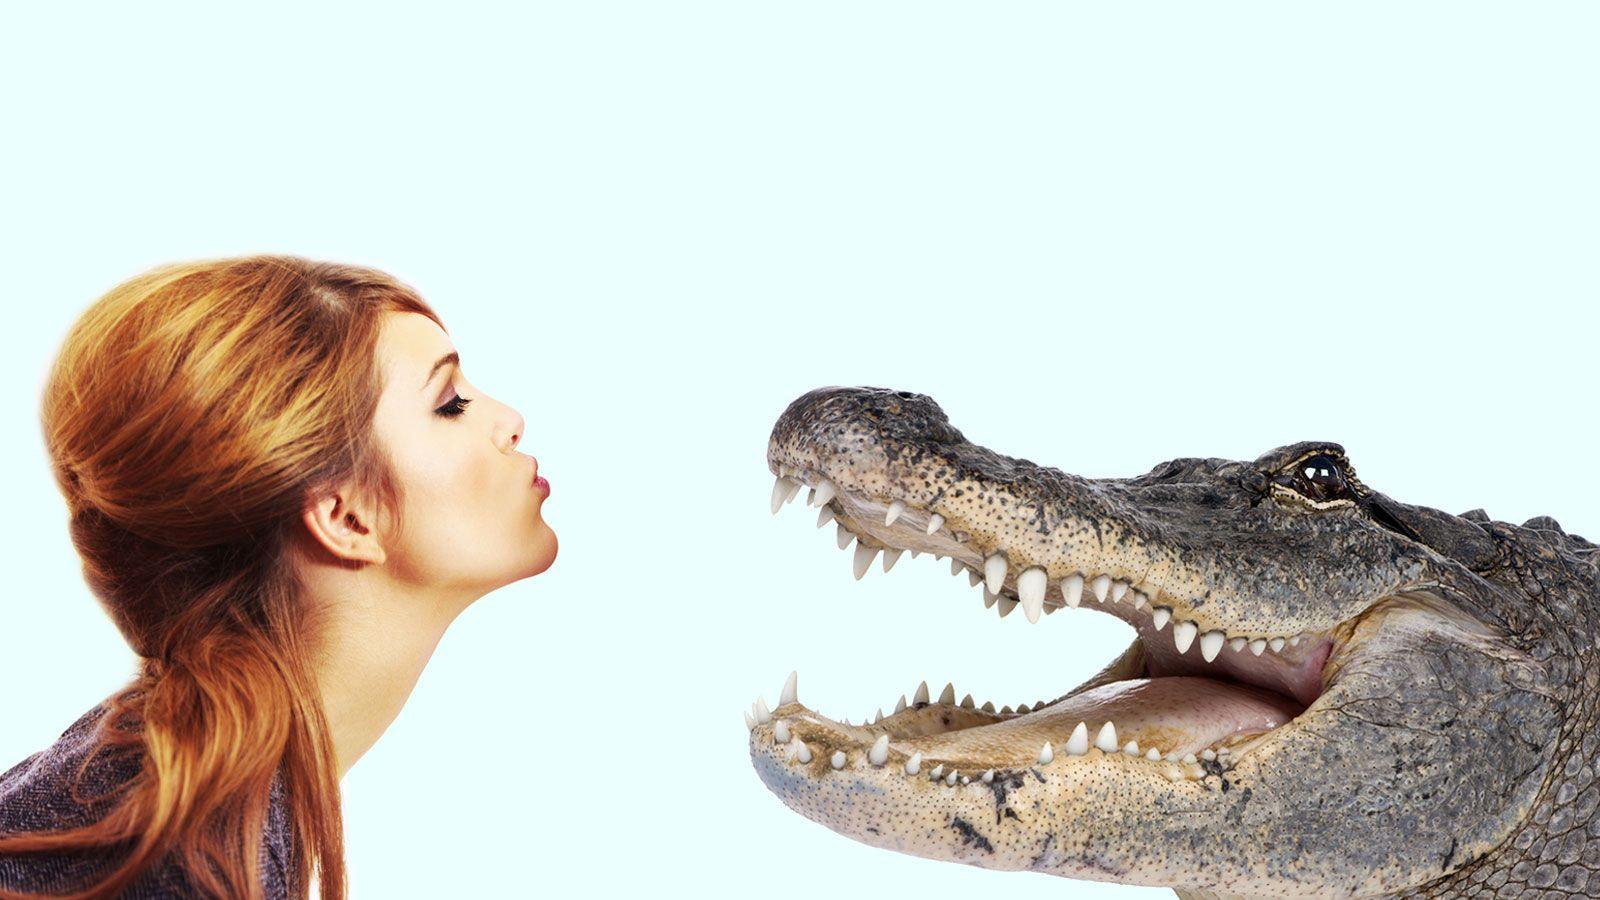 Frau küsst Krokodil